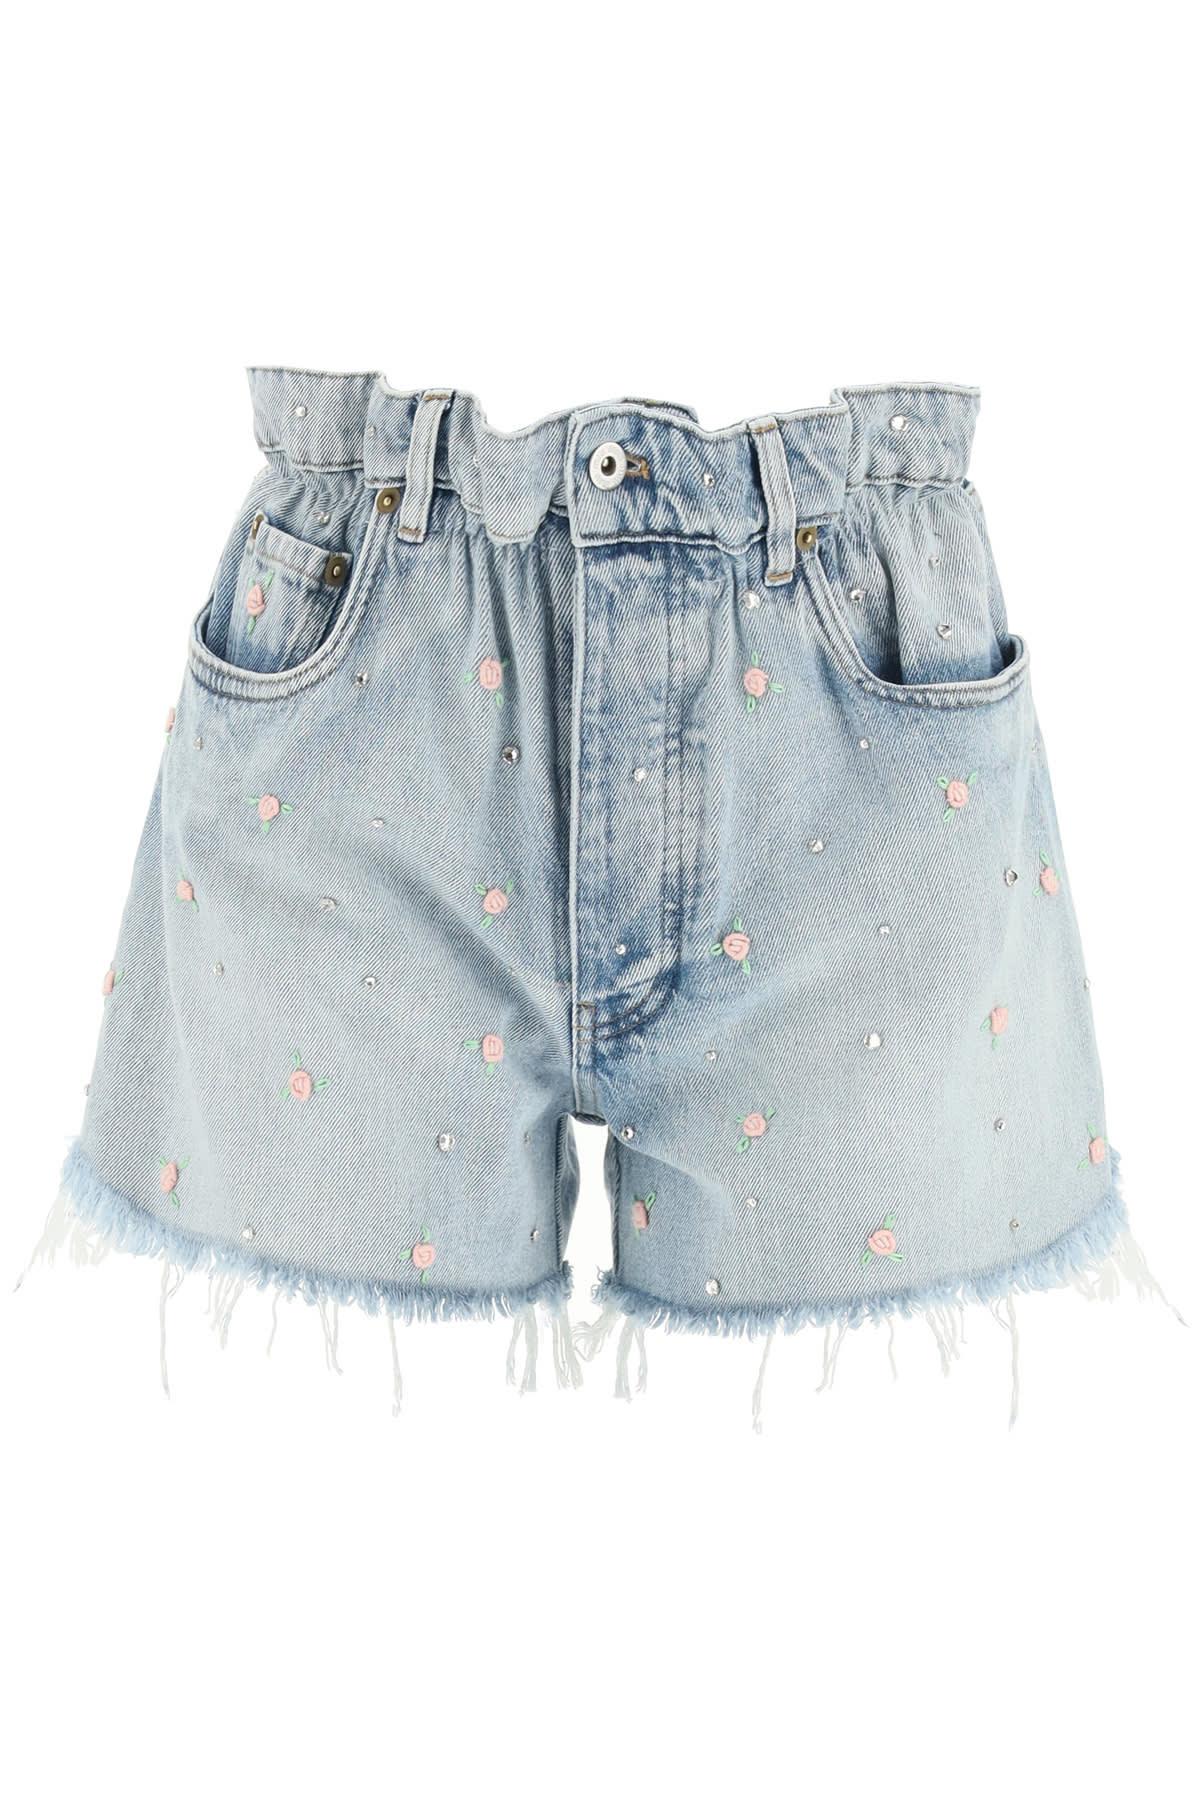 Miu Miu Mini skirts ICONIC DENIM PAPER BAG SHORTS